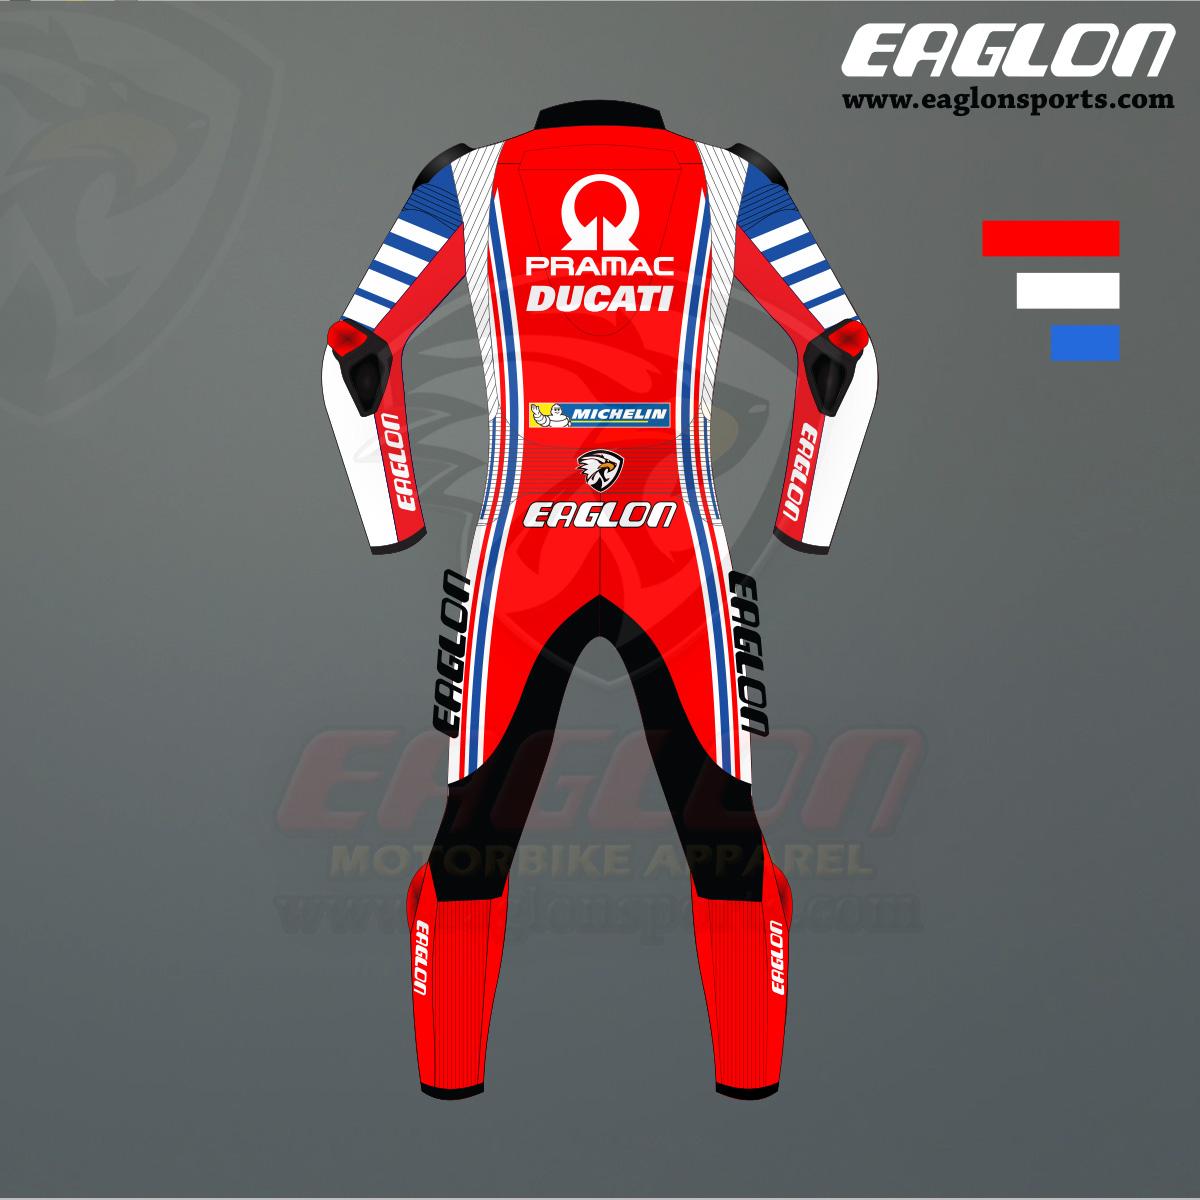 Francesco Bagnaia 2020 Ducati MotoGP Riding Suit - Eaglon Sports